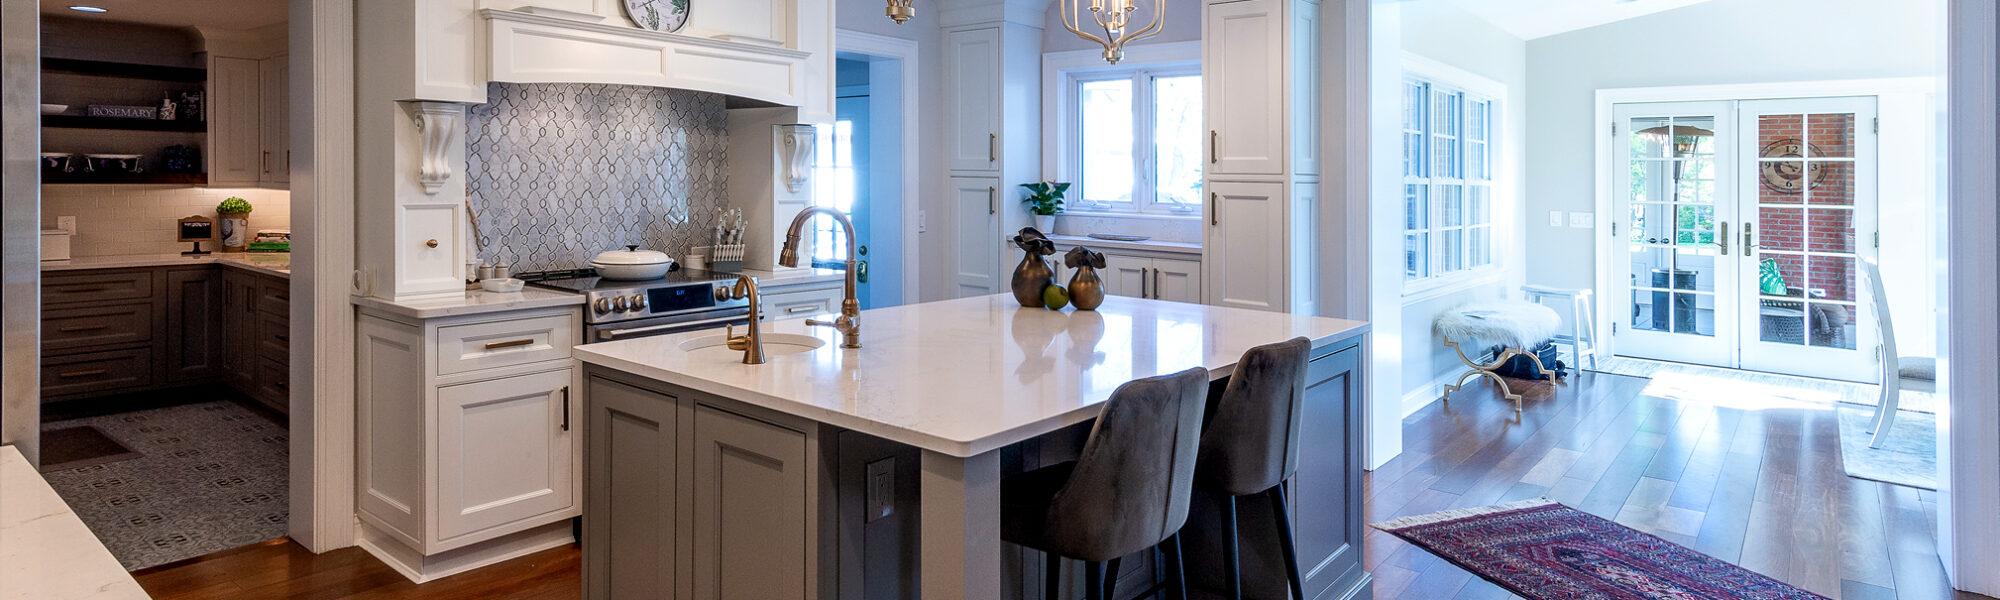 Kitchen Remodeling - Island